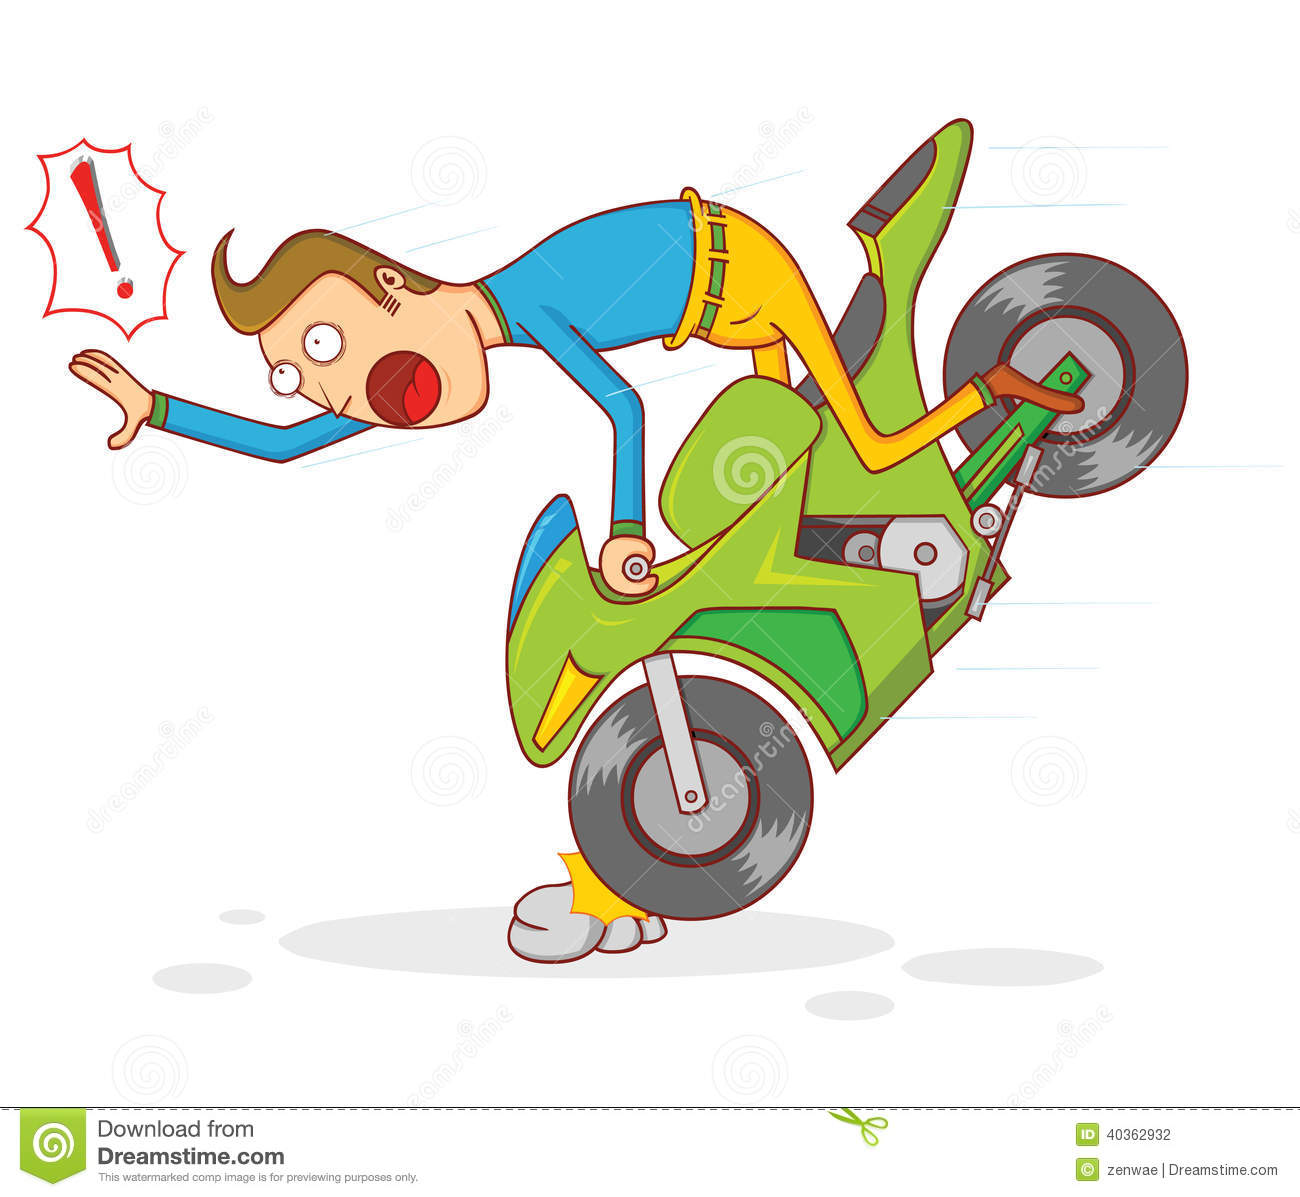 Bike accident clipart.